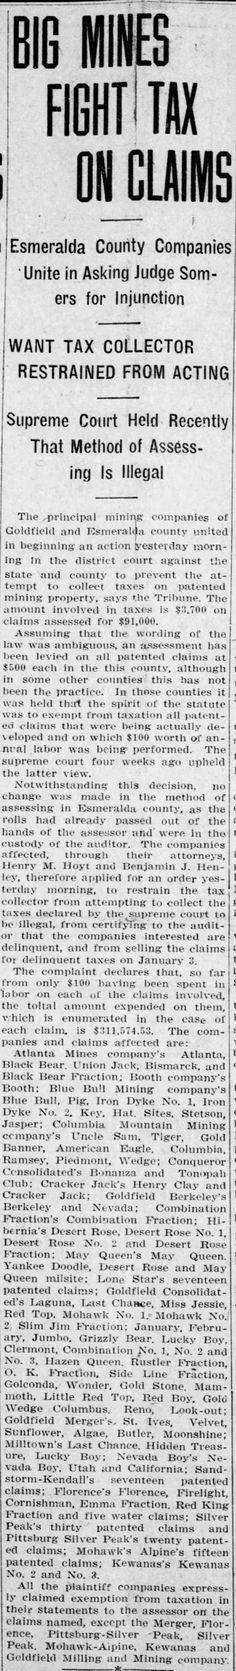 Reno Gazette-Journal, 22 Nov 1919, Sat, Main Edition Ben Henley\u0027s